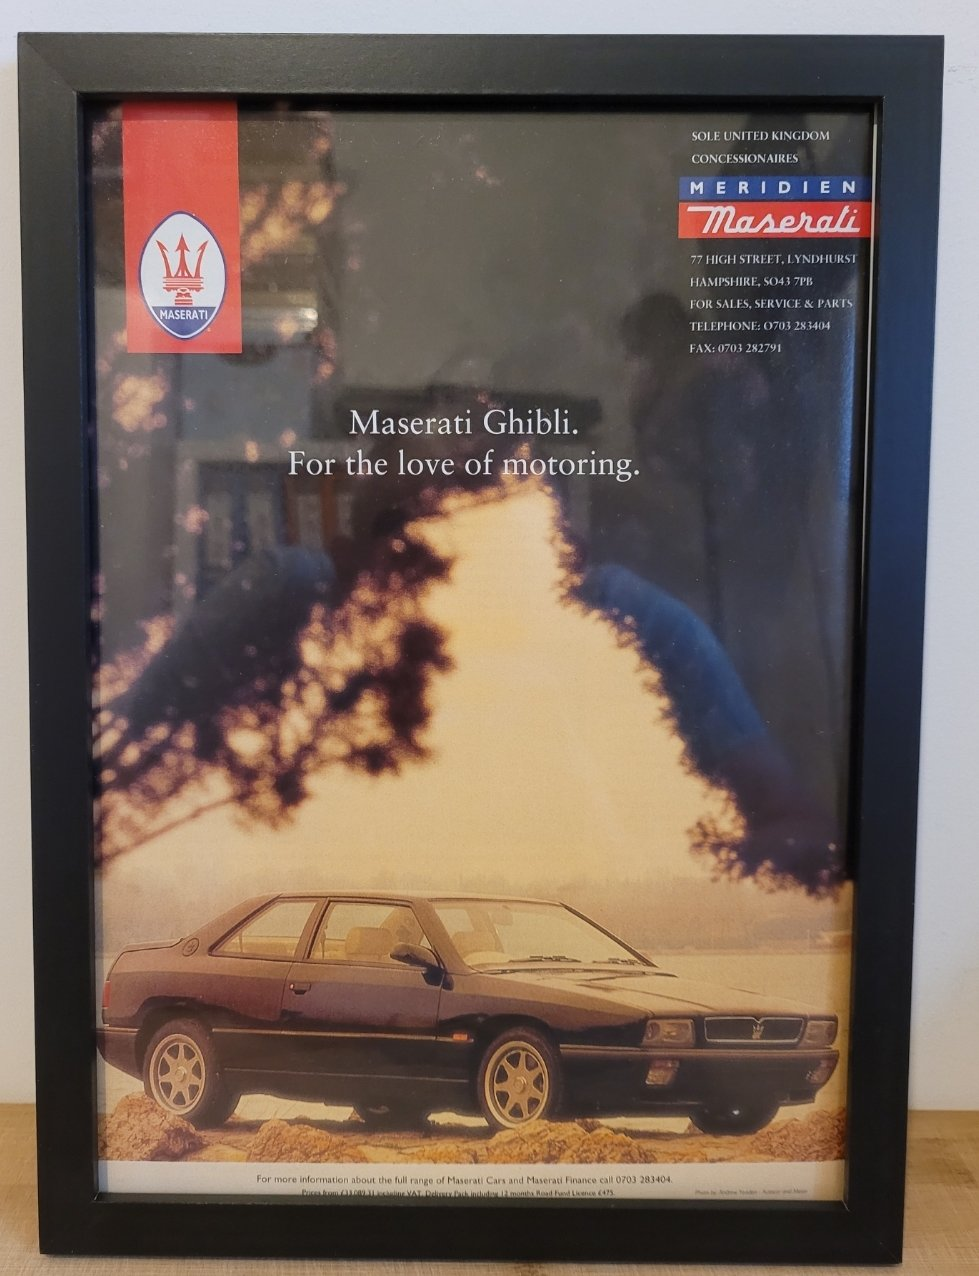 Picture of 1973 Original 1993 Maserati Ghibli Framed Advert